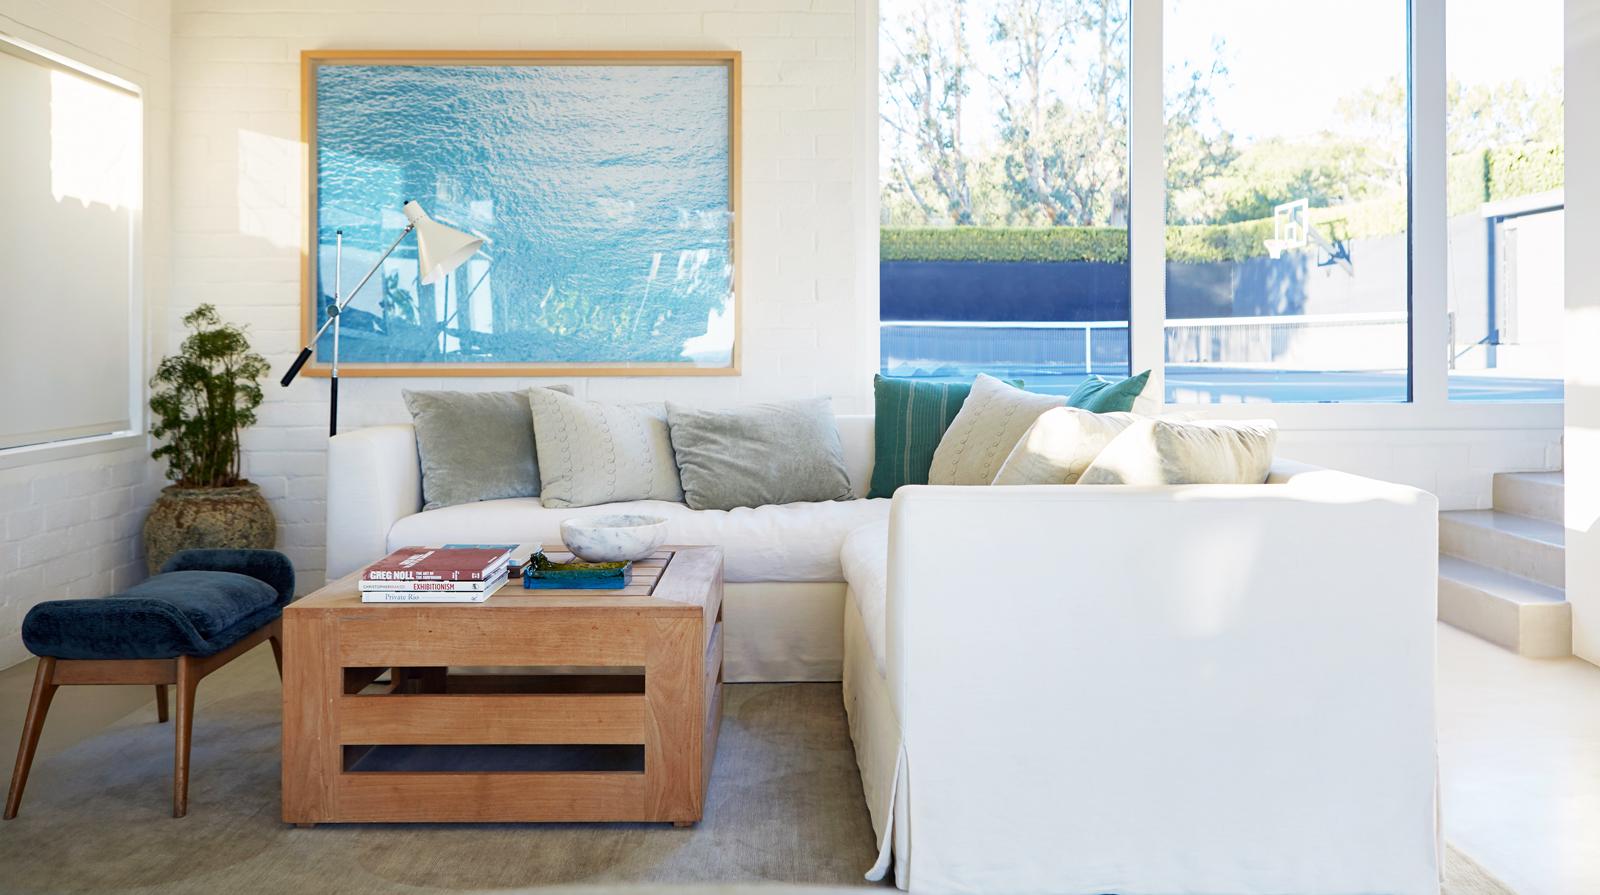 Courteney Cox's home in Malibu